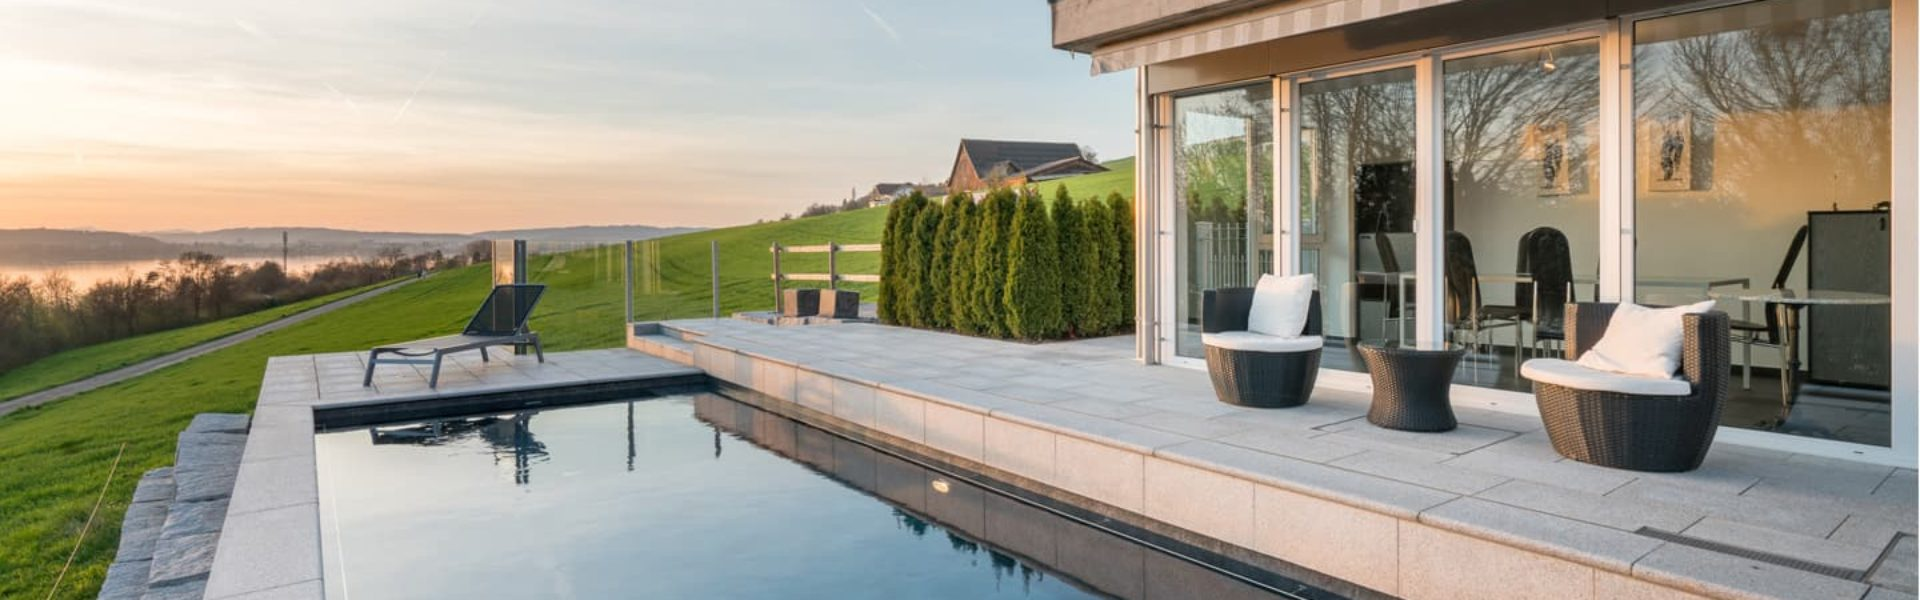 combertaldi-immobilien-verkaufserfolge